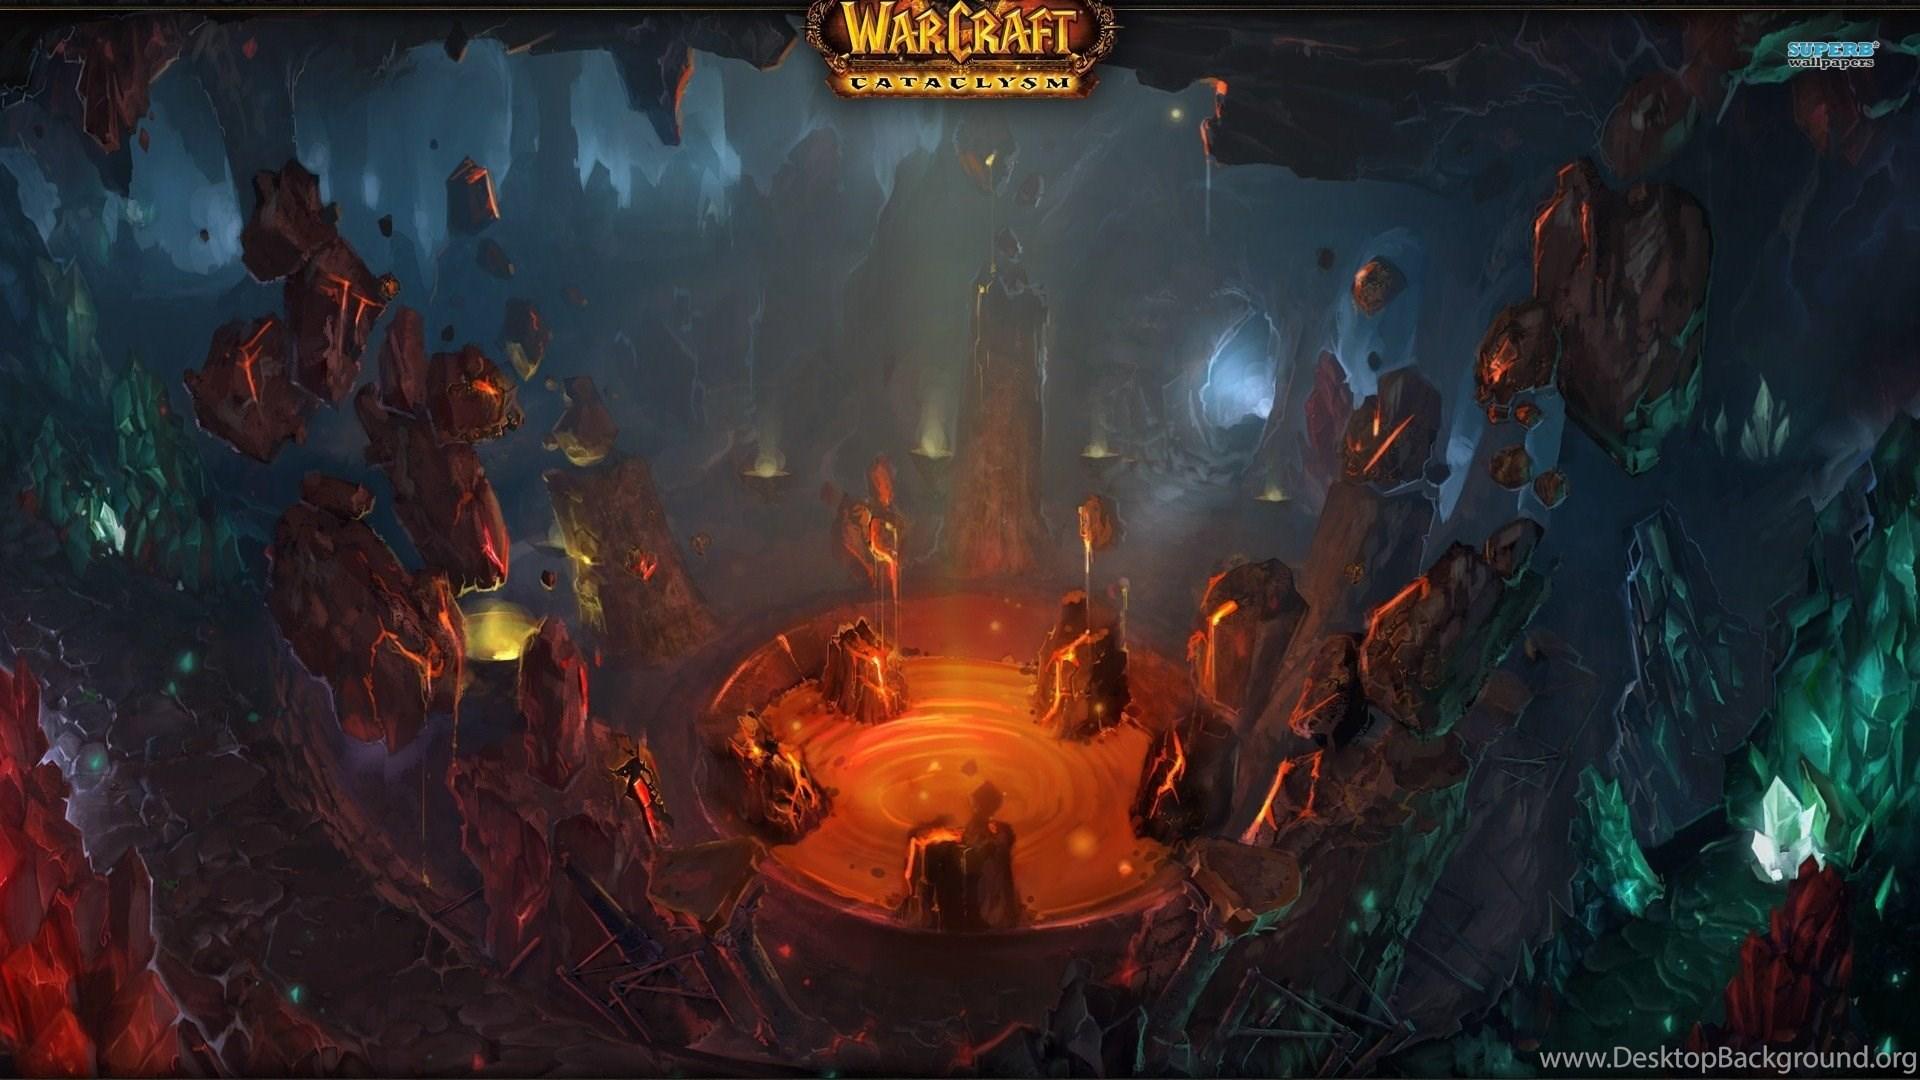 World Of Warcraft Cataclysm Wallpapers Game Wallpapers Desktop